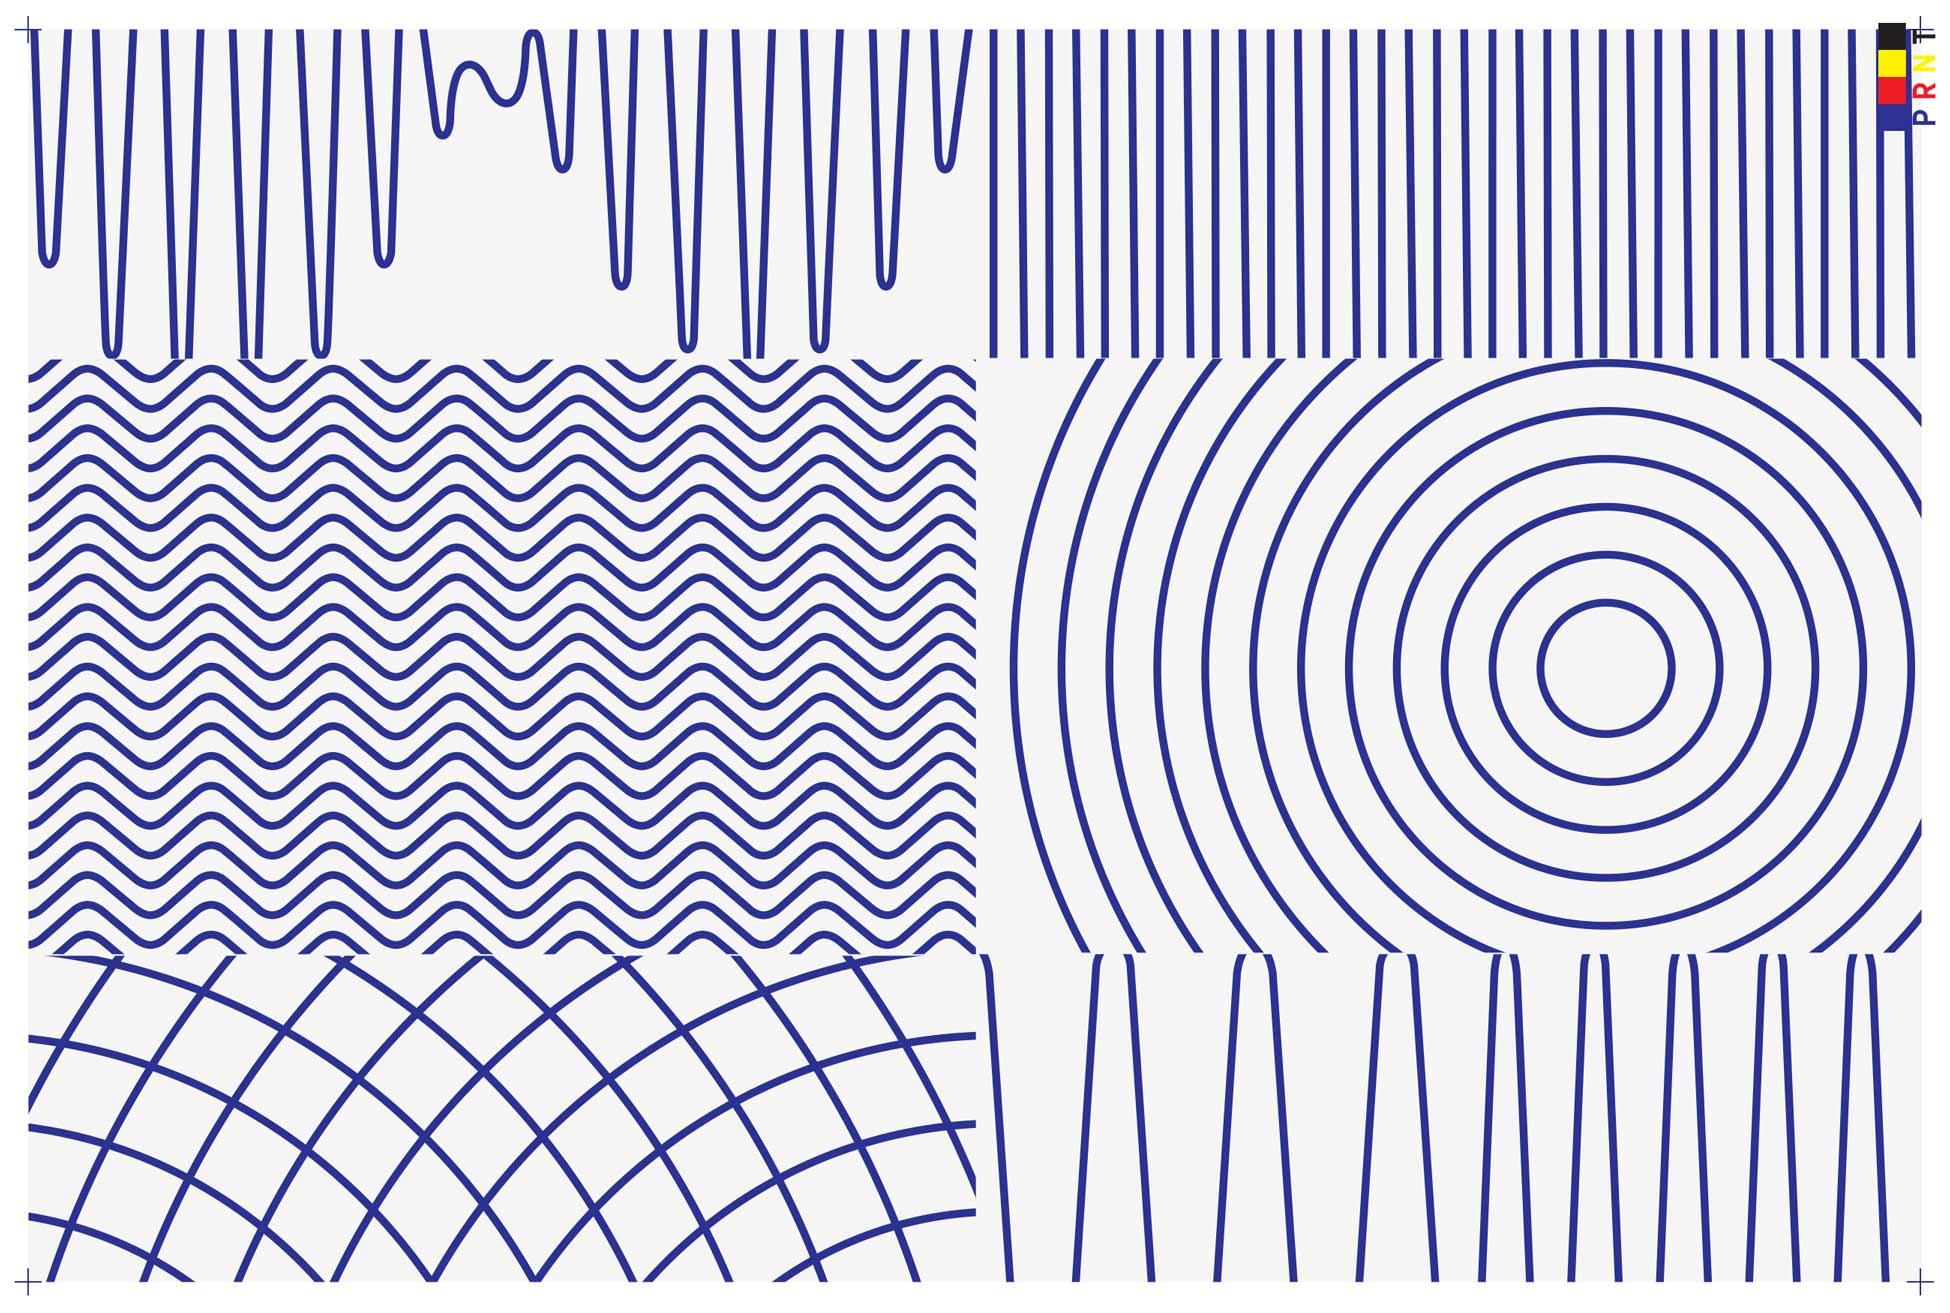 PRNT_pattern.jpg